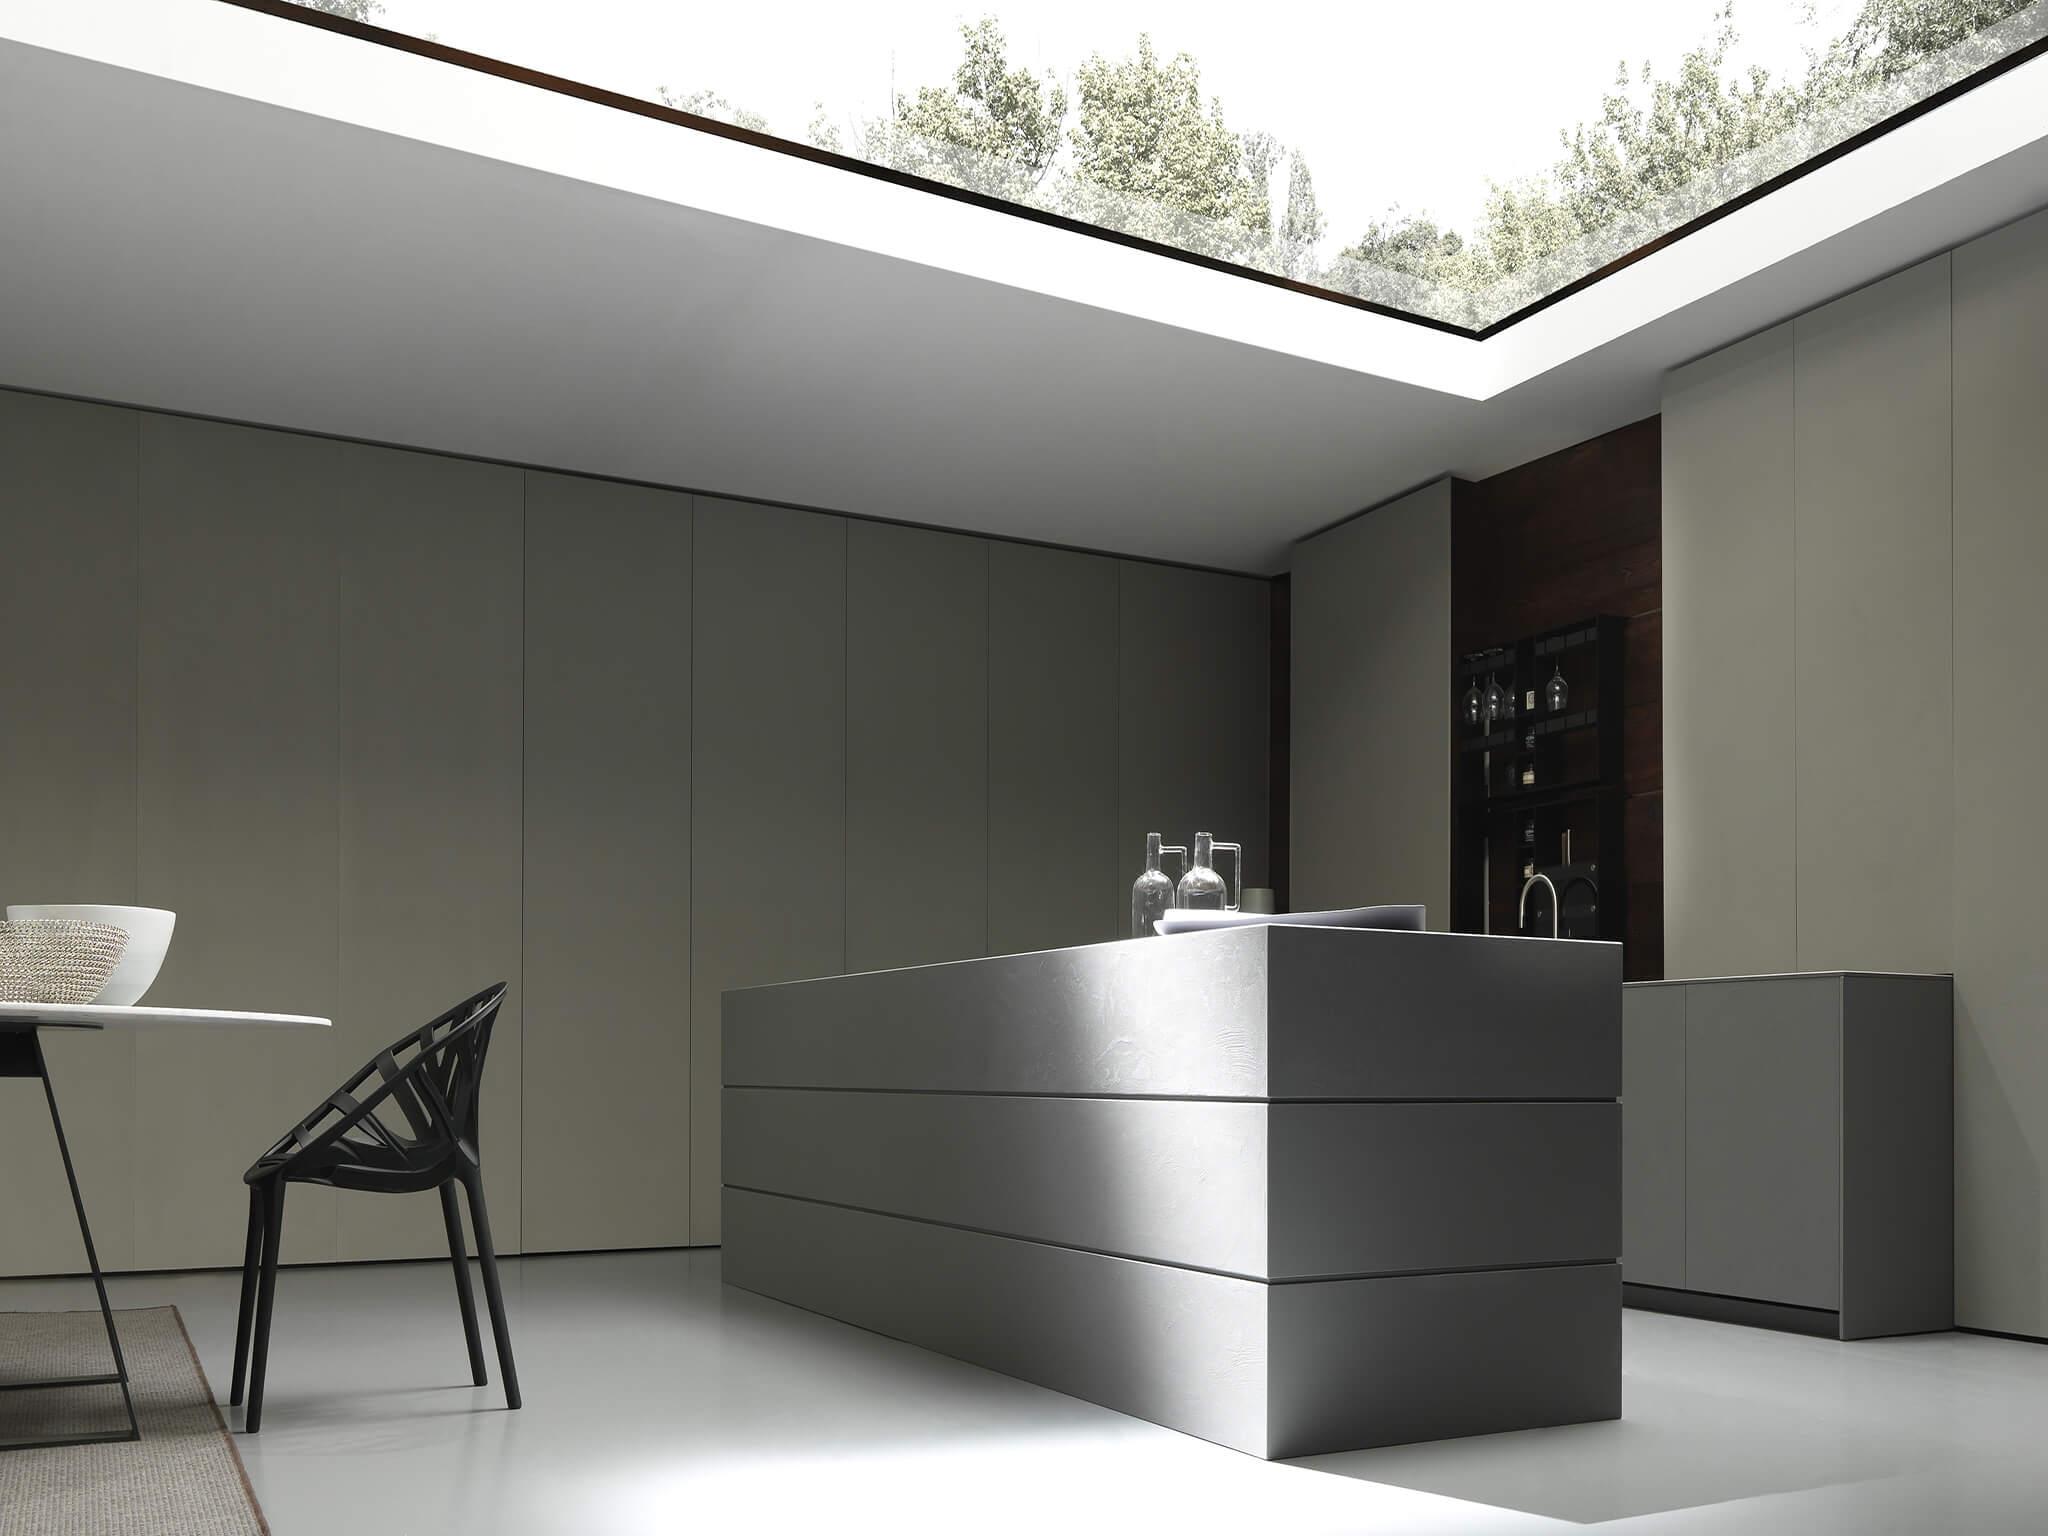 Blade contemporary kitchen cabinet by Modulnova | Archisesto Chicago